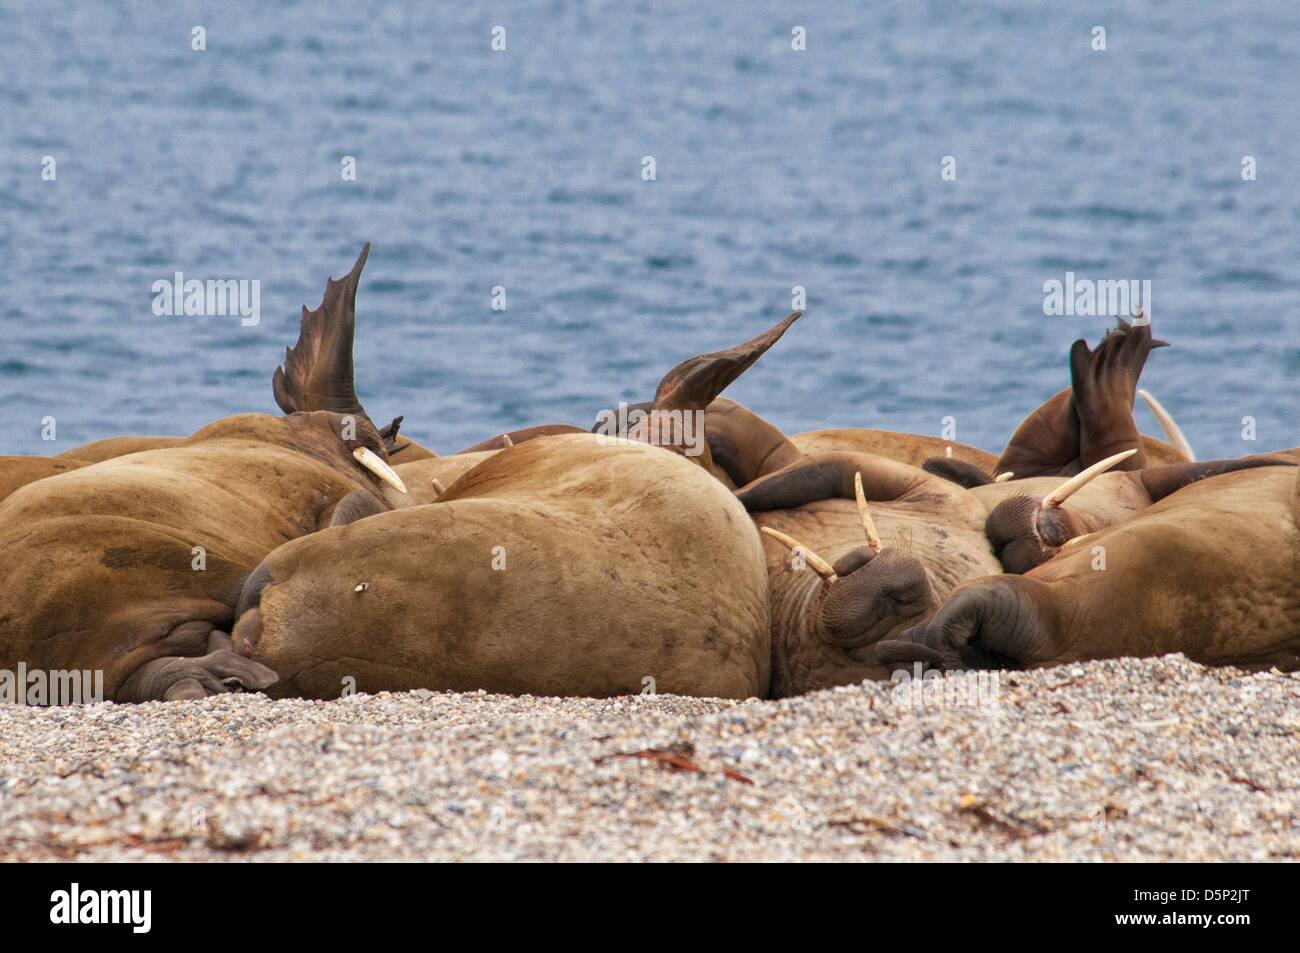 walrus-haul-out-odobenus-rosmarus-toreli